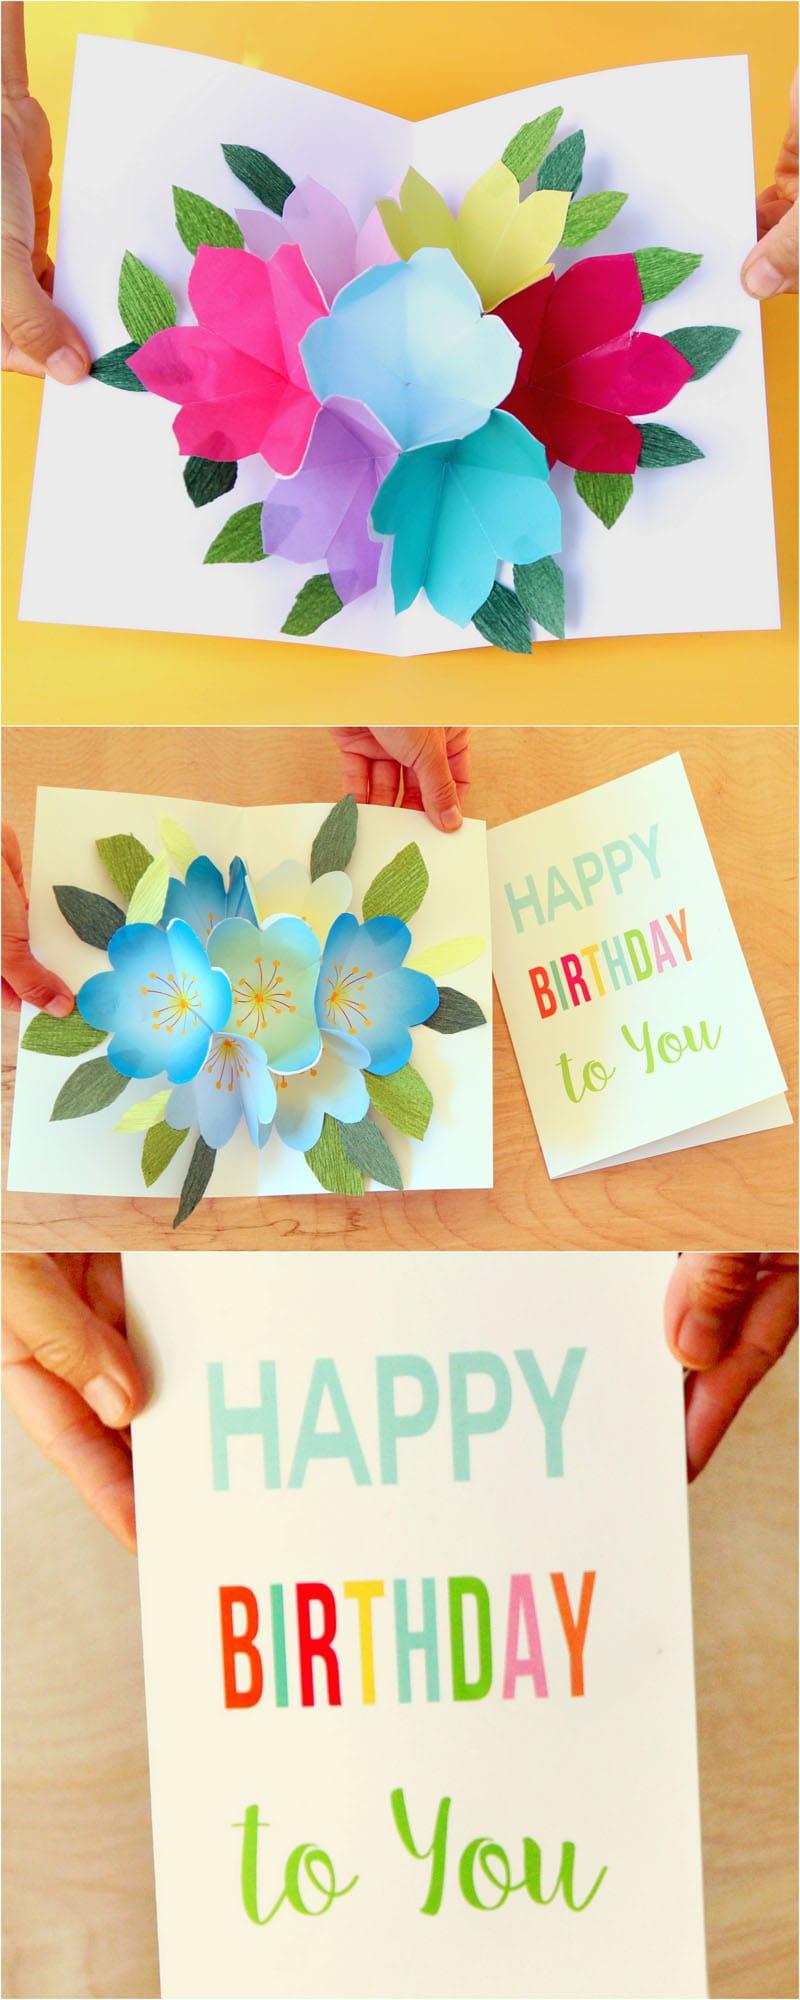 Imgenes De Happy Birthday Pop Up Cards For Dad